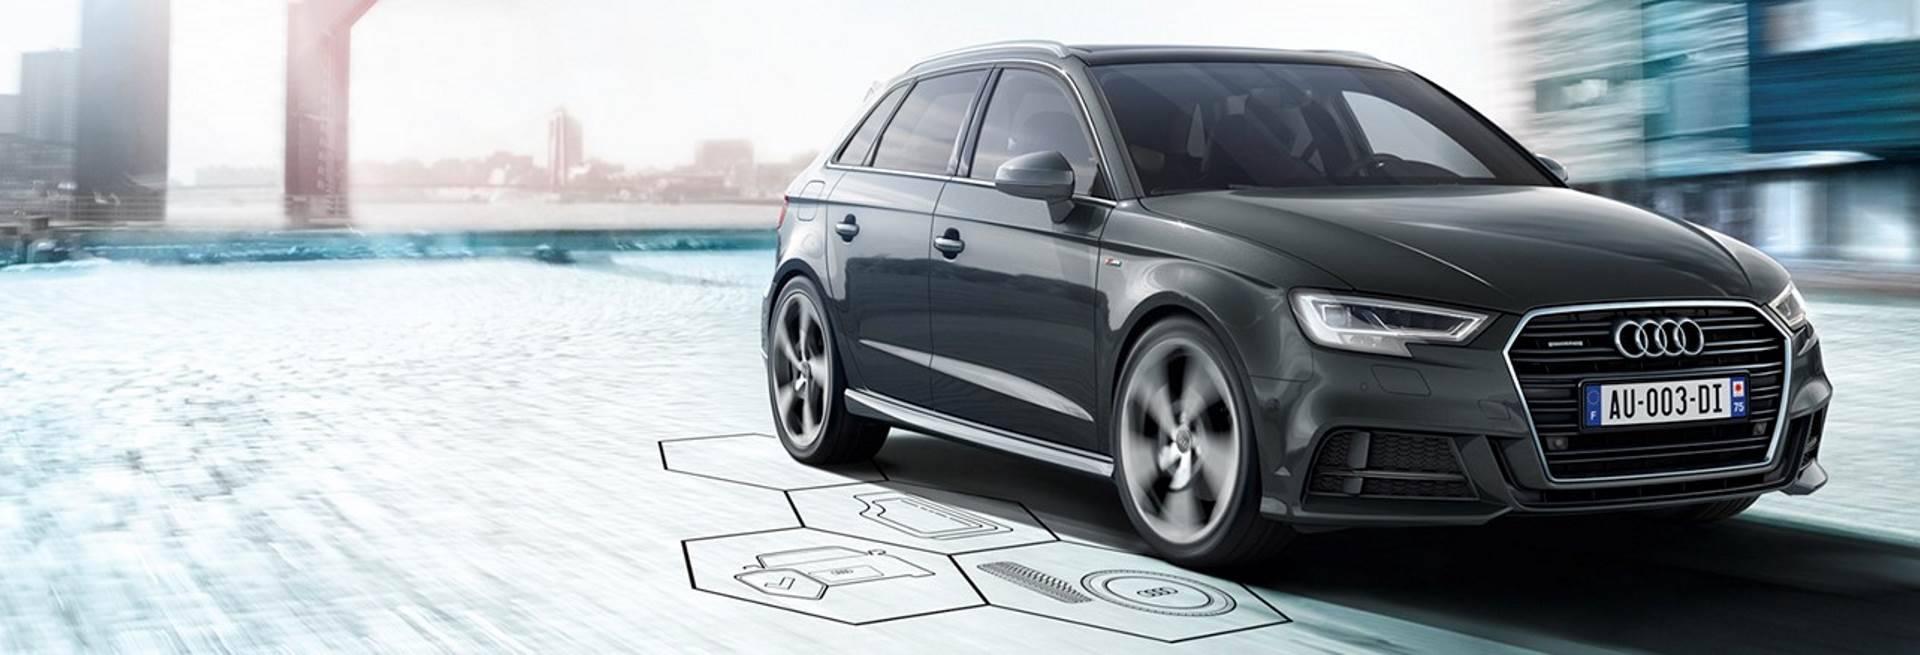 Offres SAV printemps Audi 2018